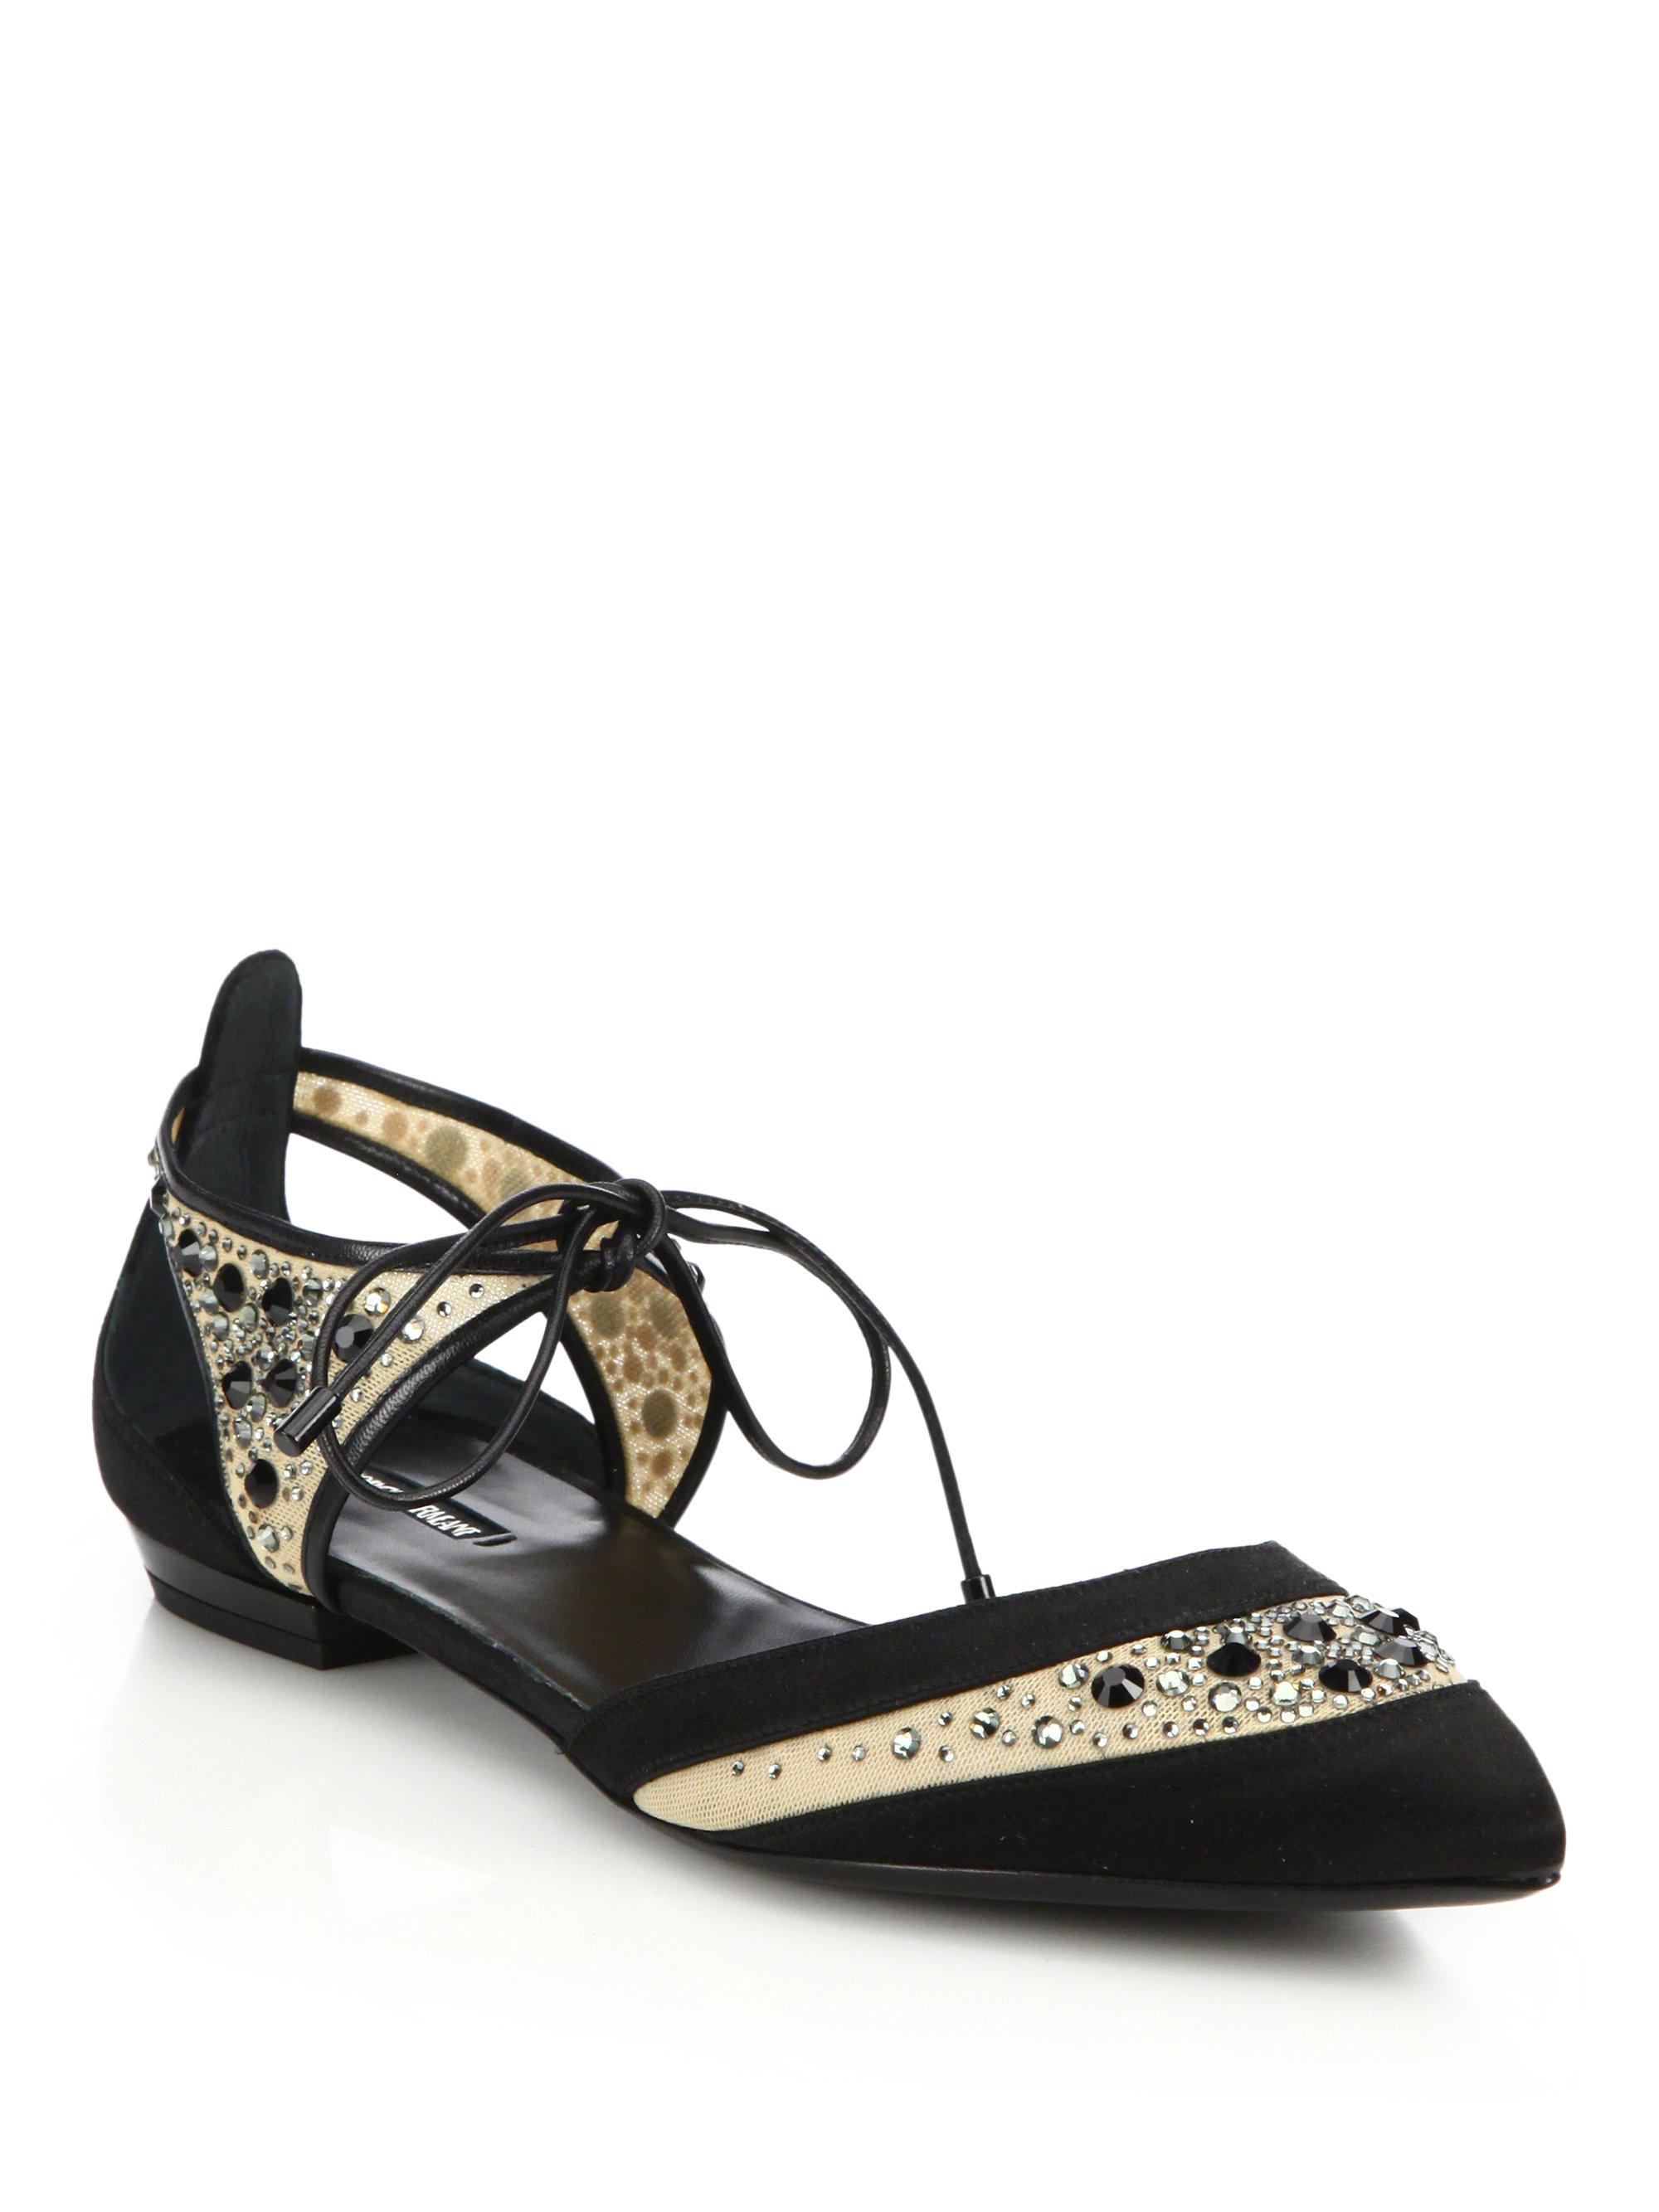 Black evening sandals flat - Gallery